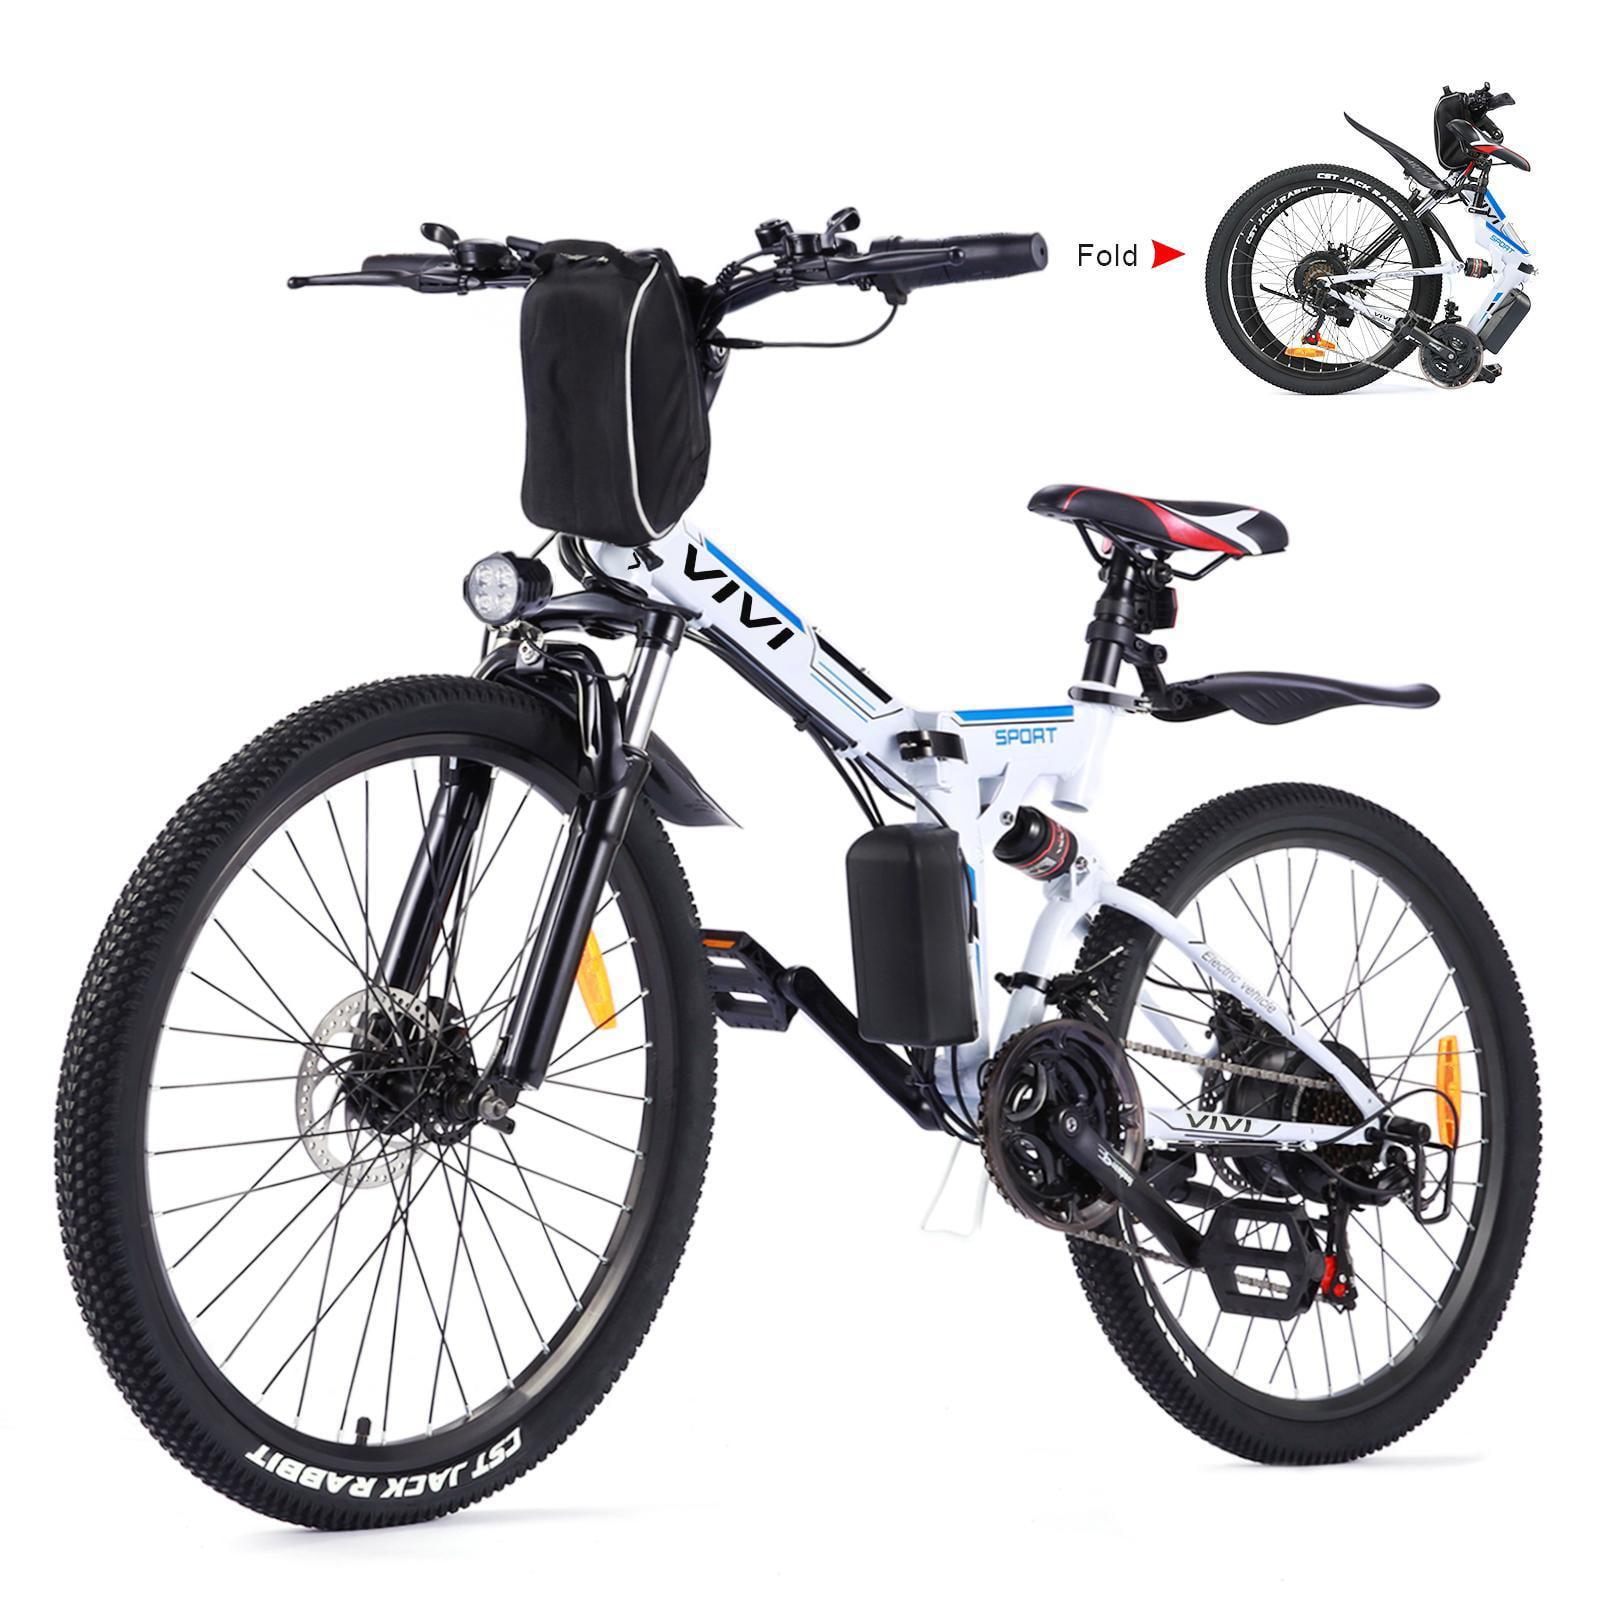 Details about  /26INCH Electric Bike Mountain Bicycle E-Bike 350W Shimano 21Speed Lightweight*